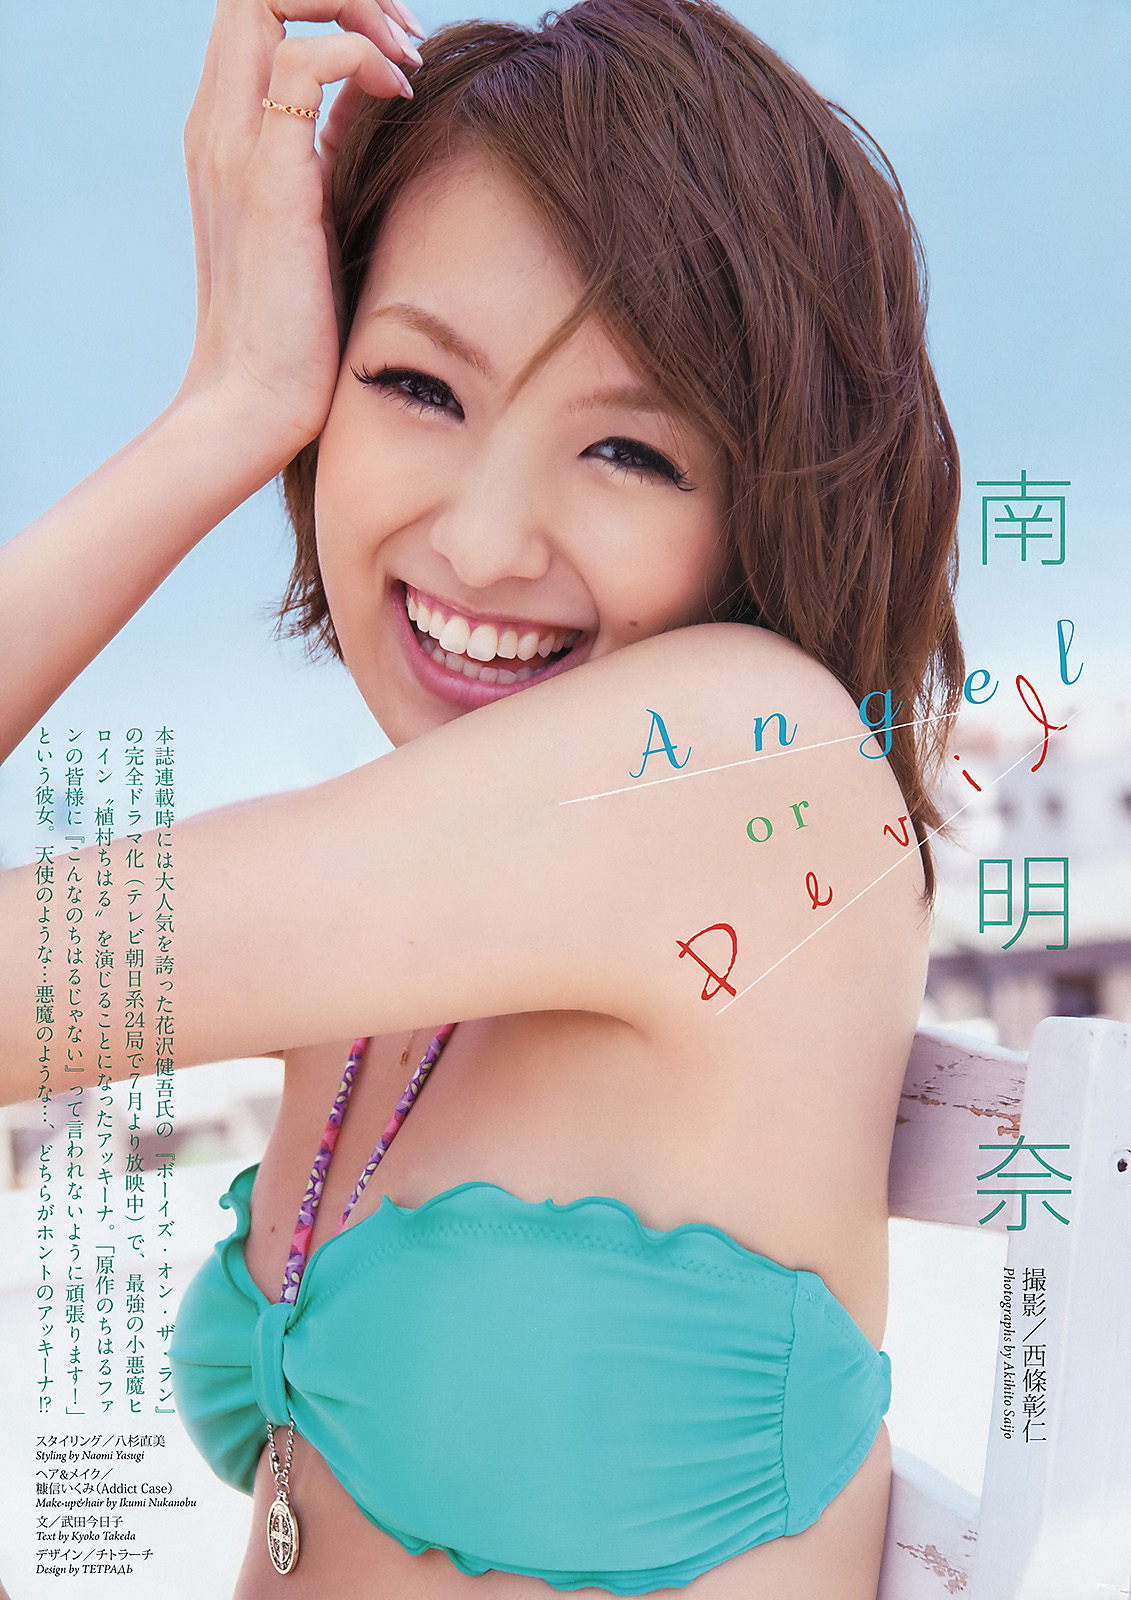 Minami Akina Android Iphone Wallpaper 32685 Asiachan